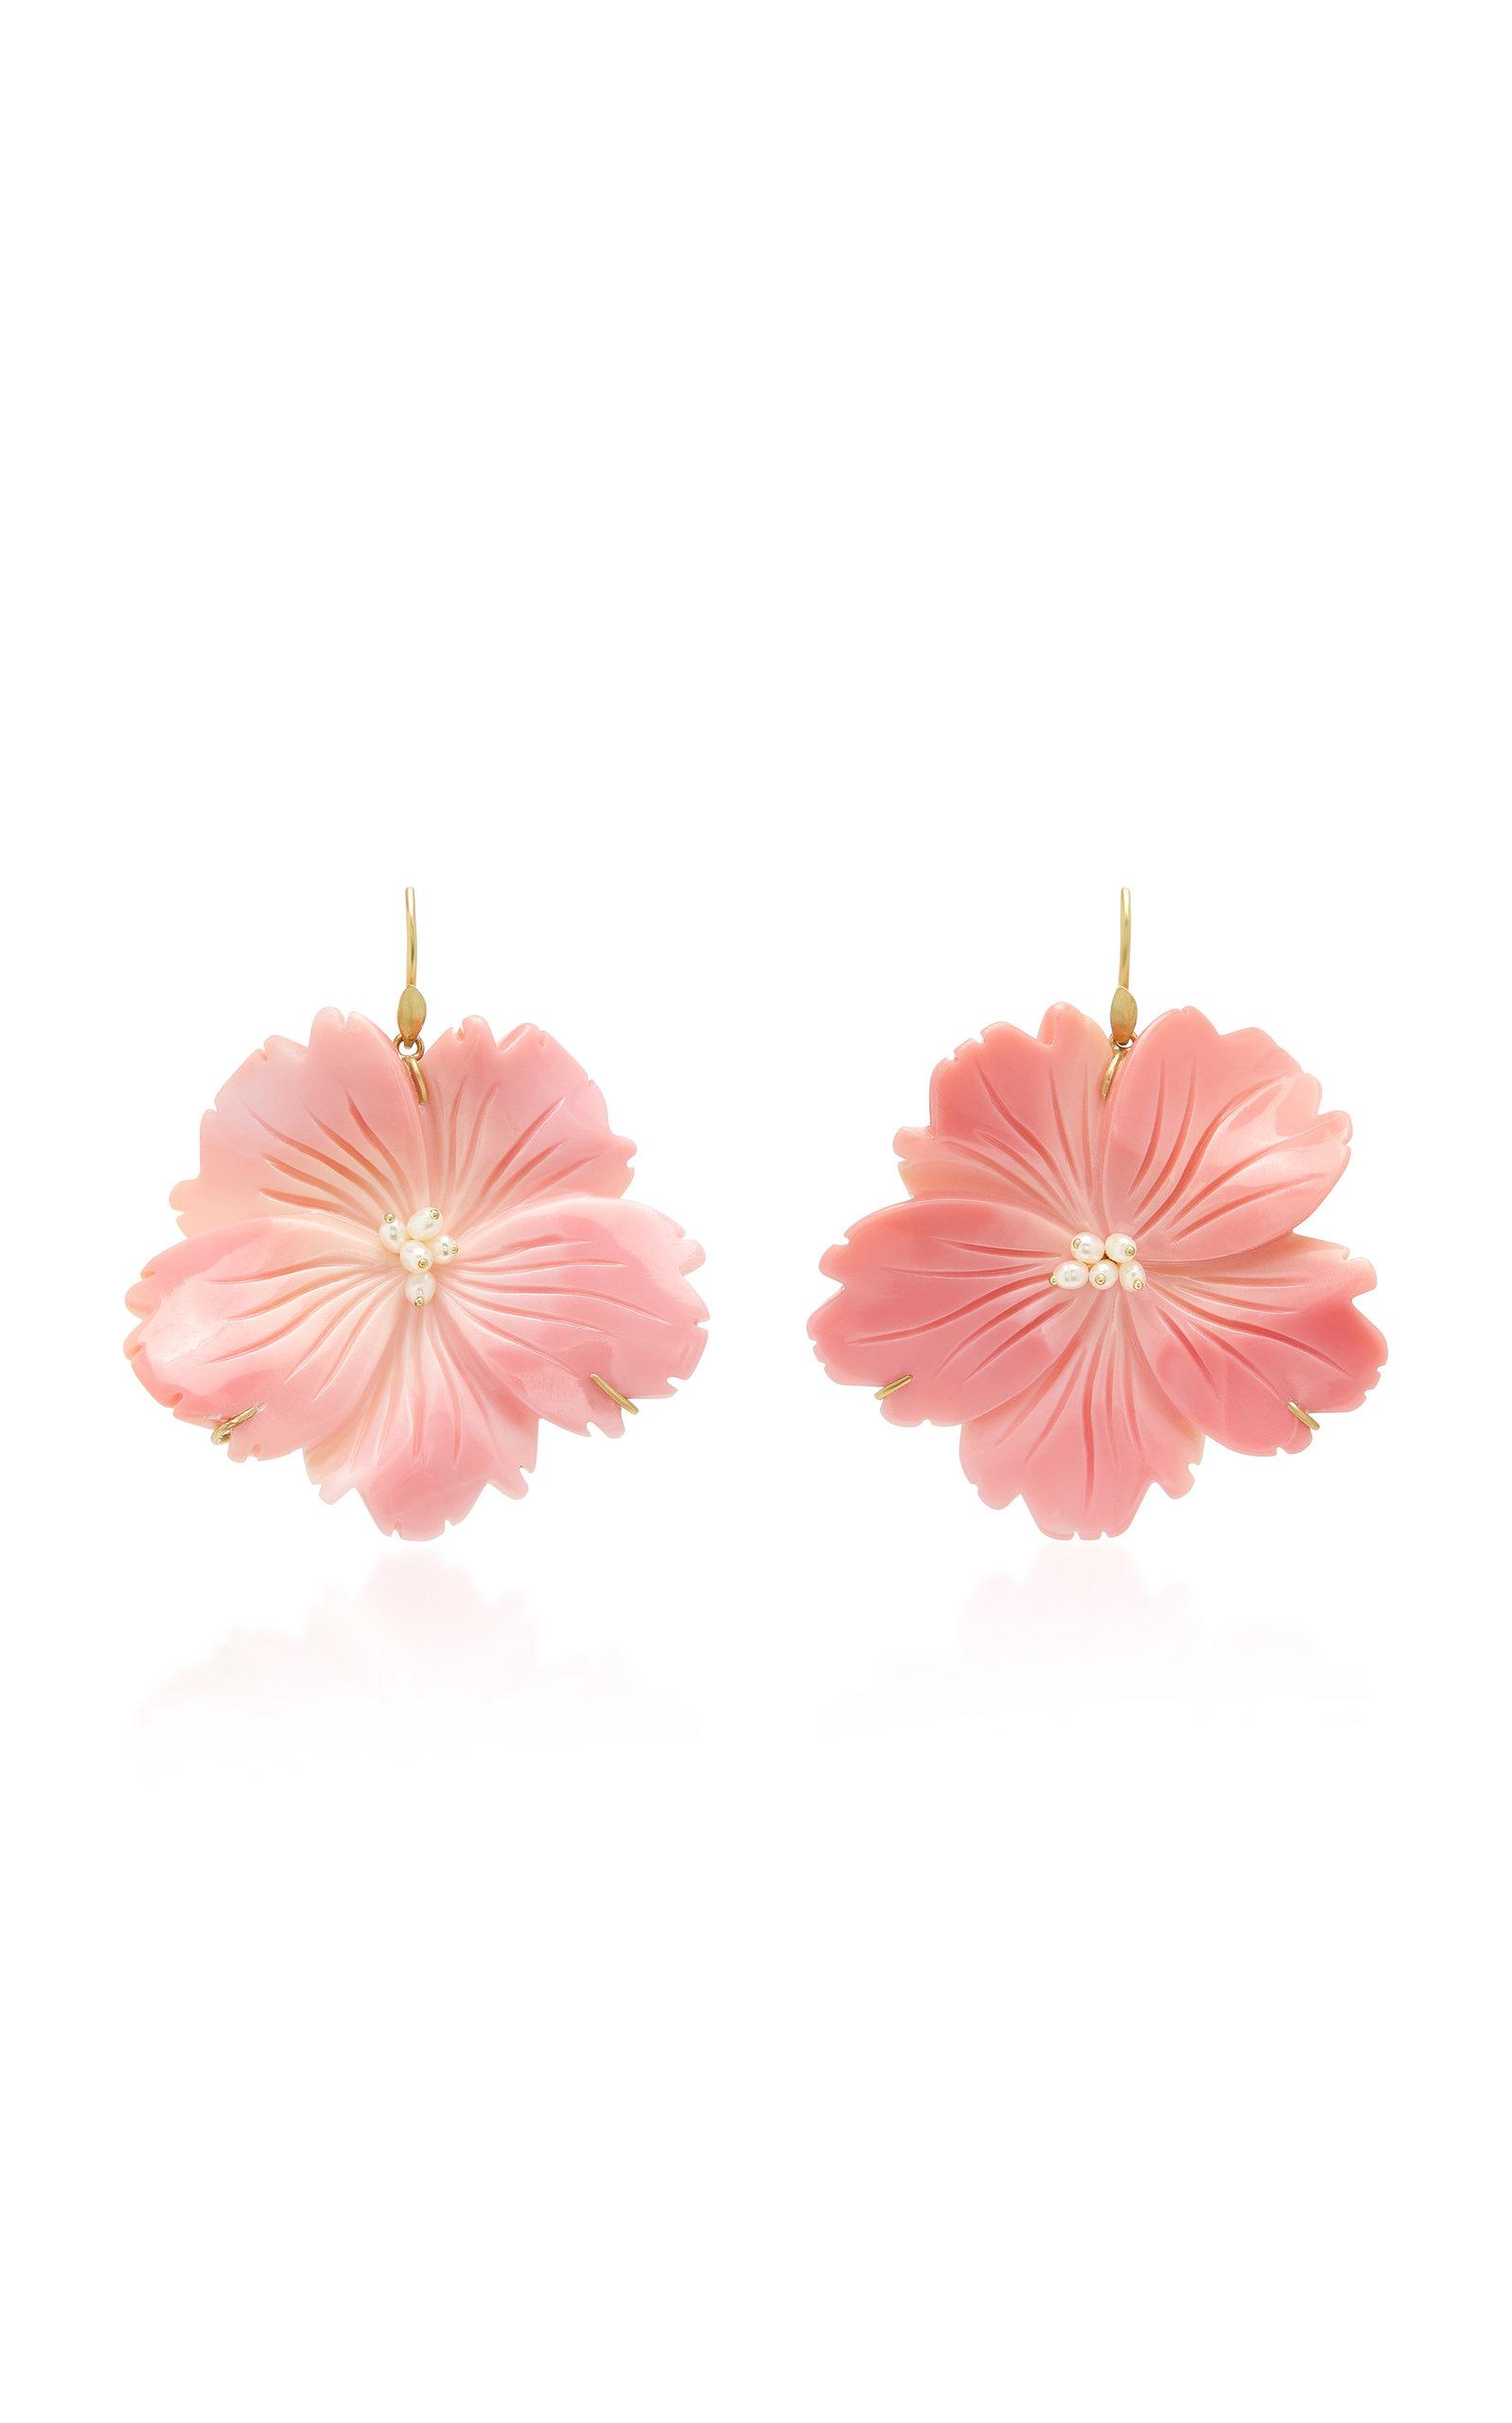 Annette Ferdinandsen Jewelry EXCLUSIVE: WILD ROSE PINK CONCH SHELL EARRING